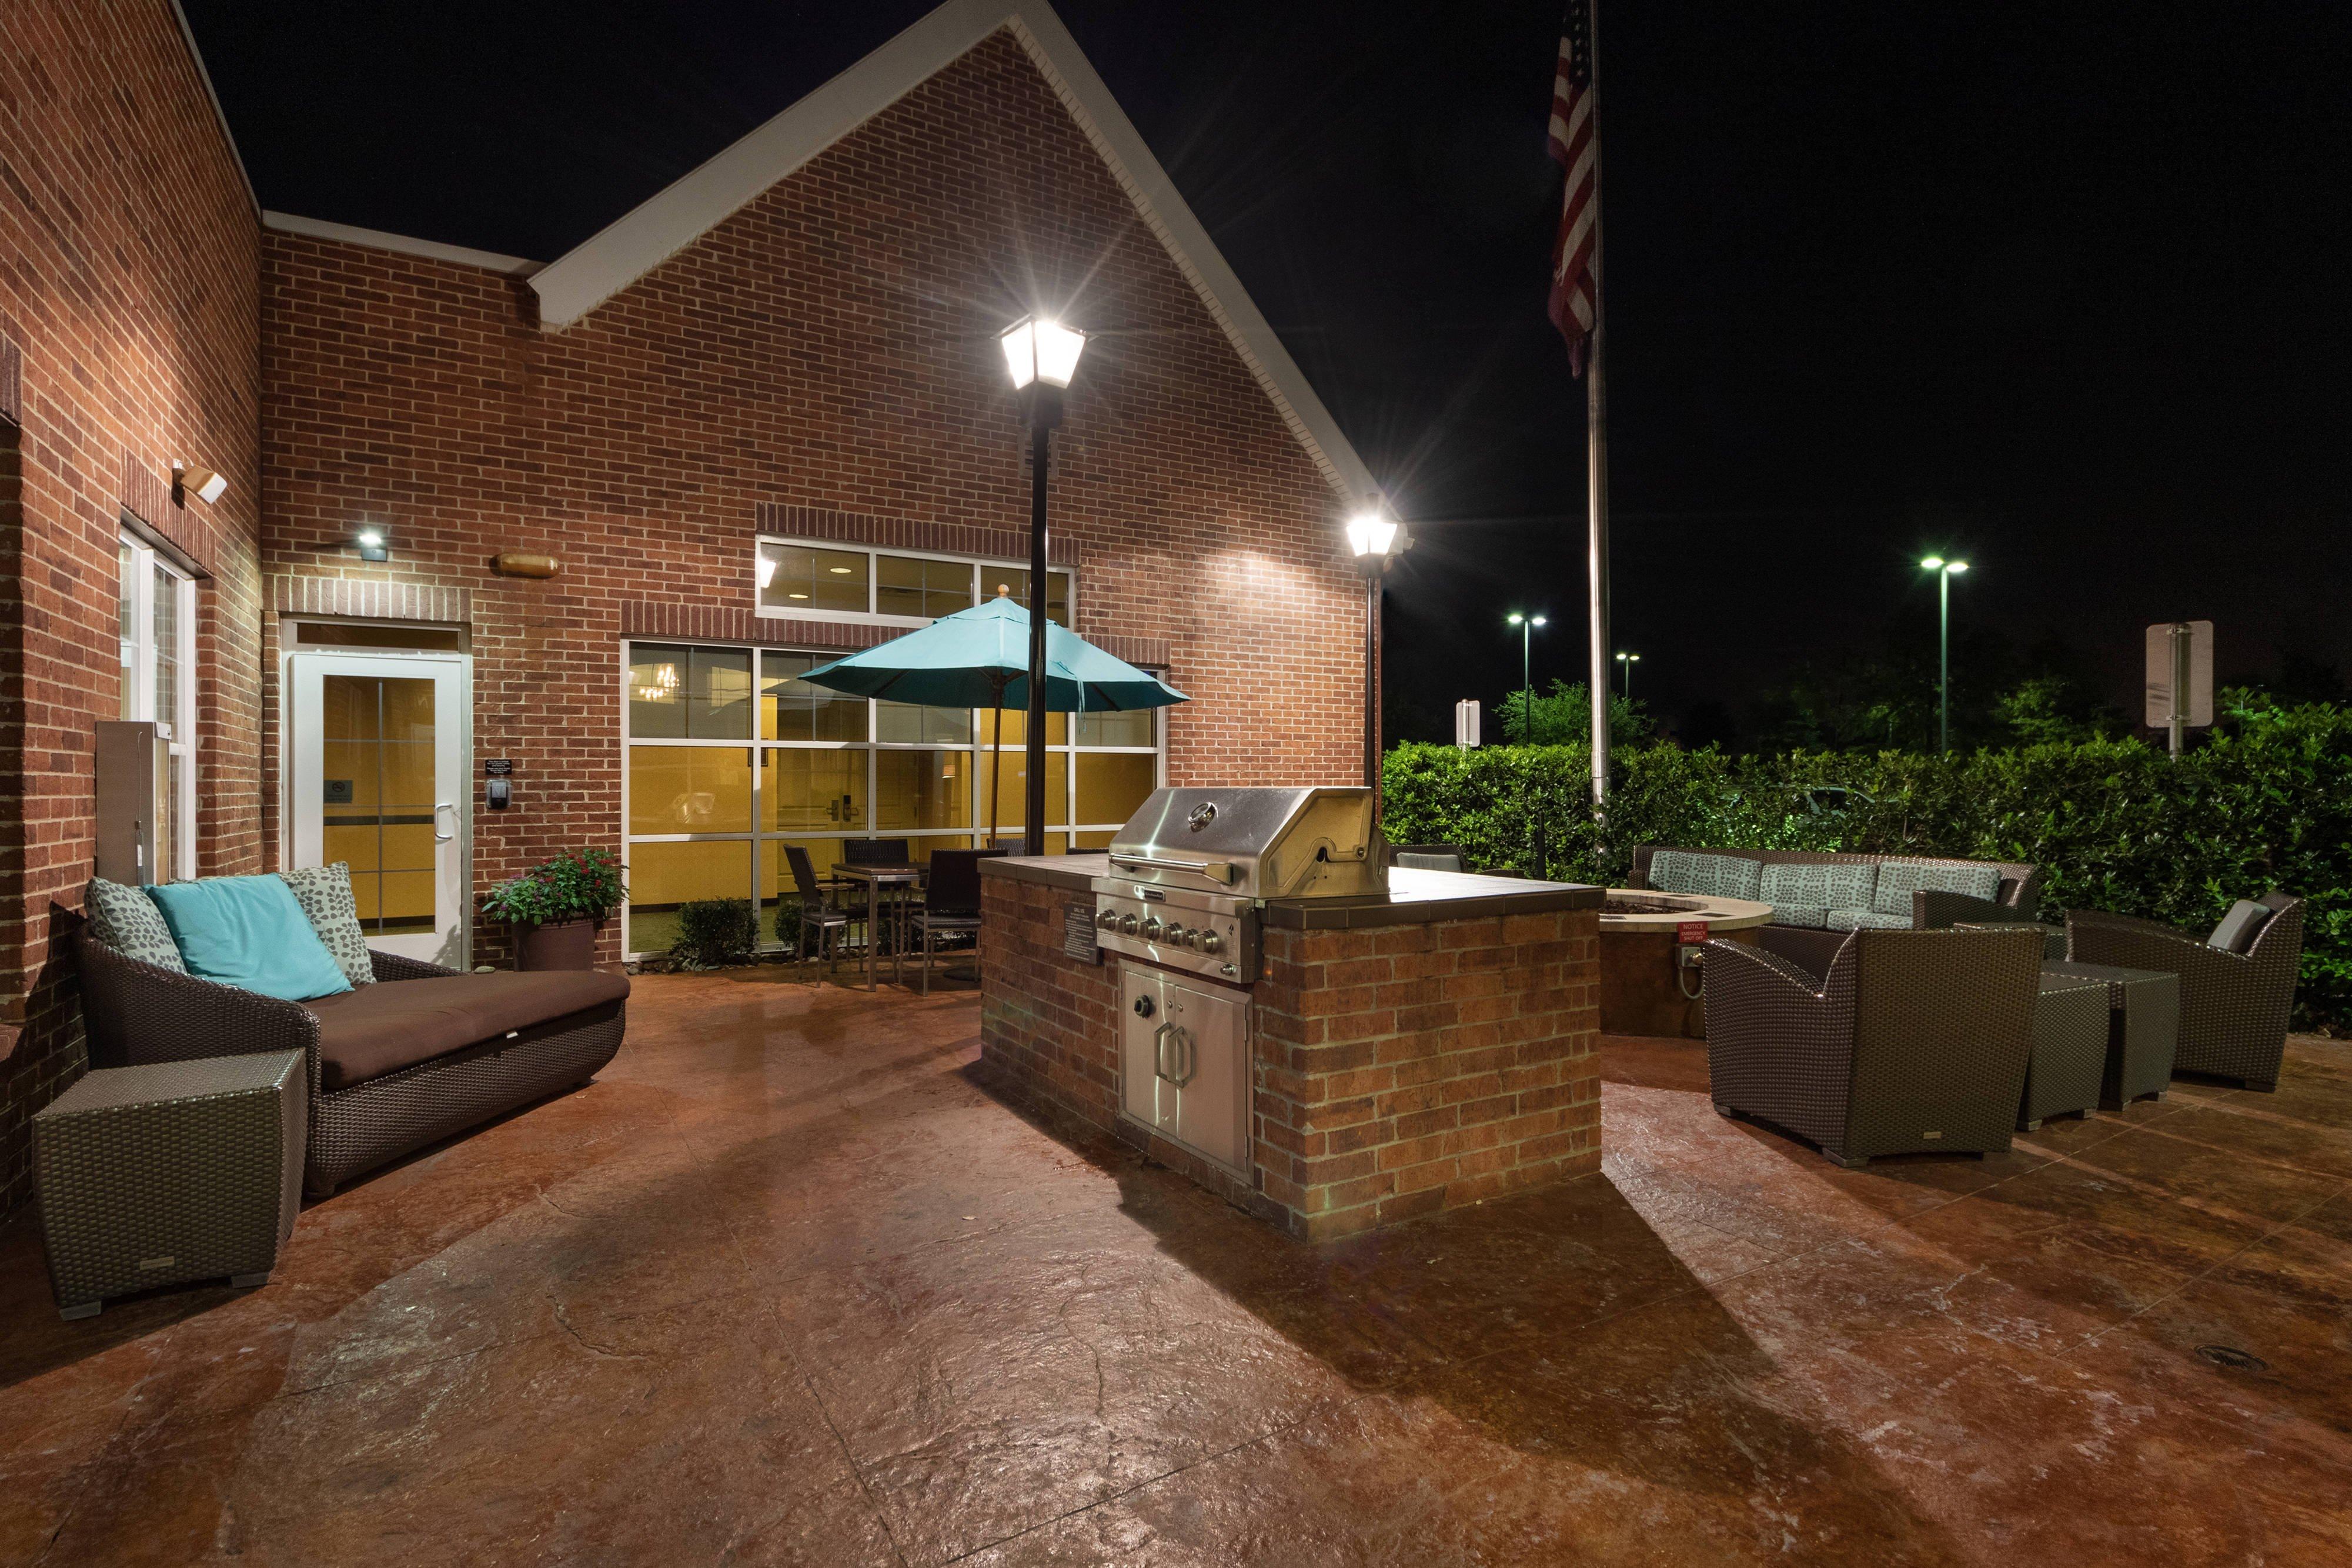 Residence Inn Dallas DFW Airport South